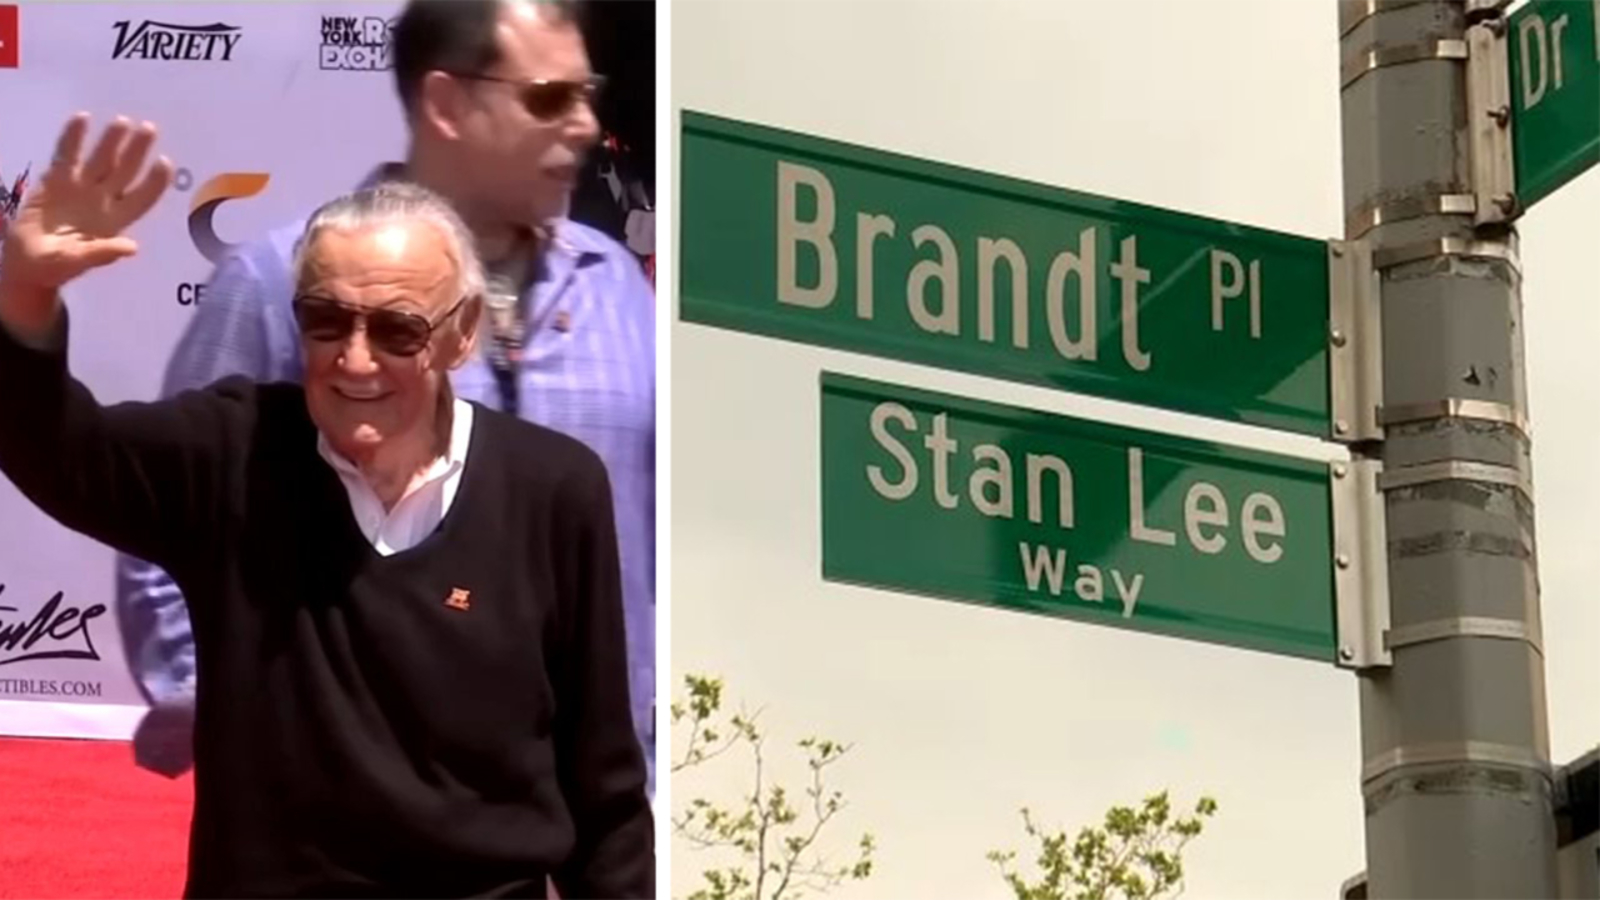 Stan Lee strada